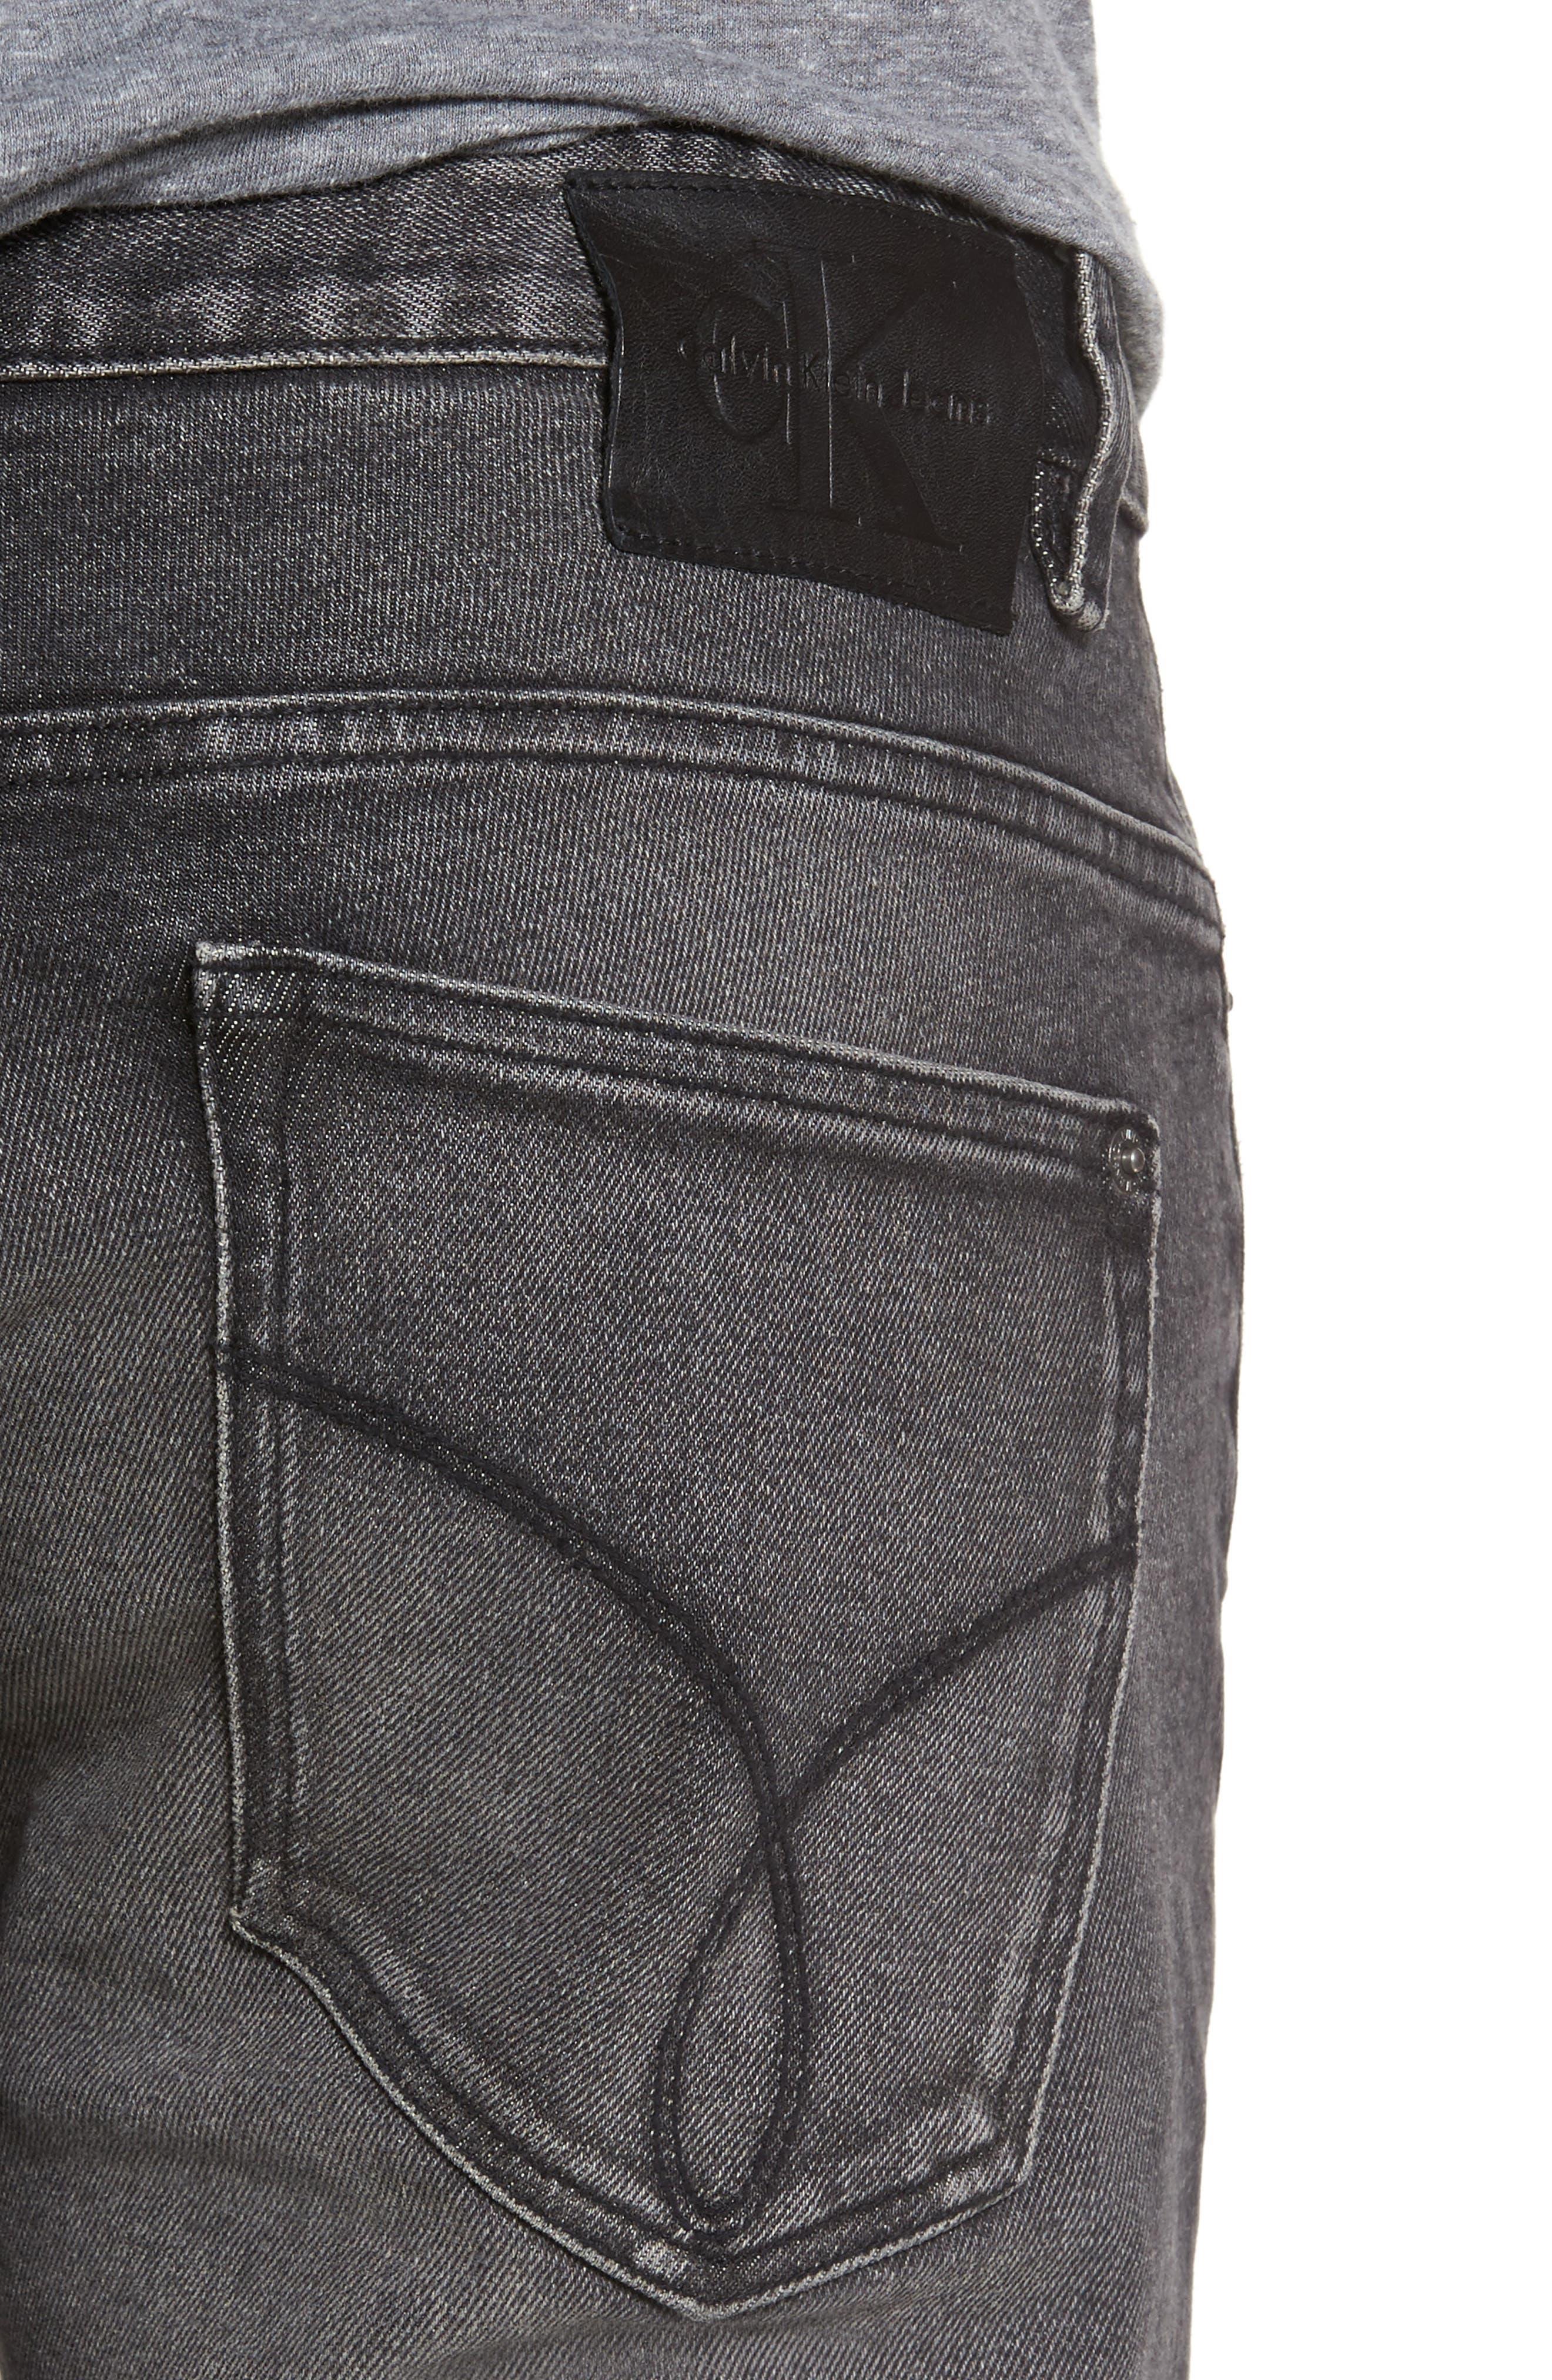 Skinny Jeans,                             Alternate thumbnail 4, color,                             Dark Stone